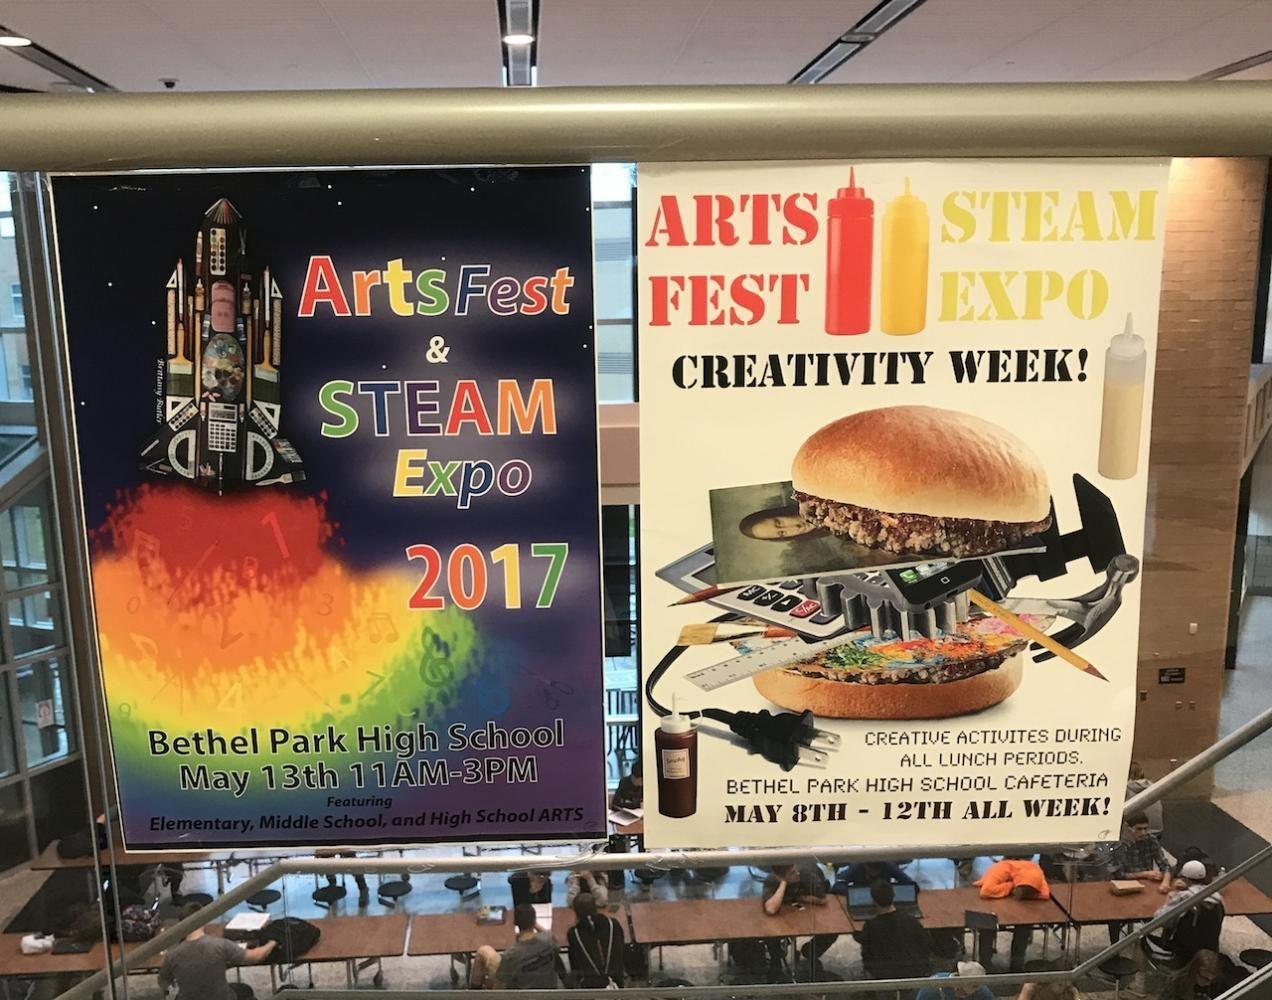 BPHS Arts Festival spreading creativity